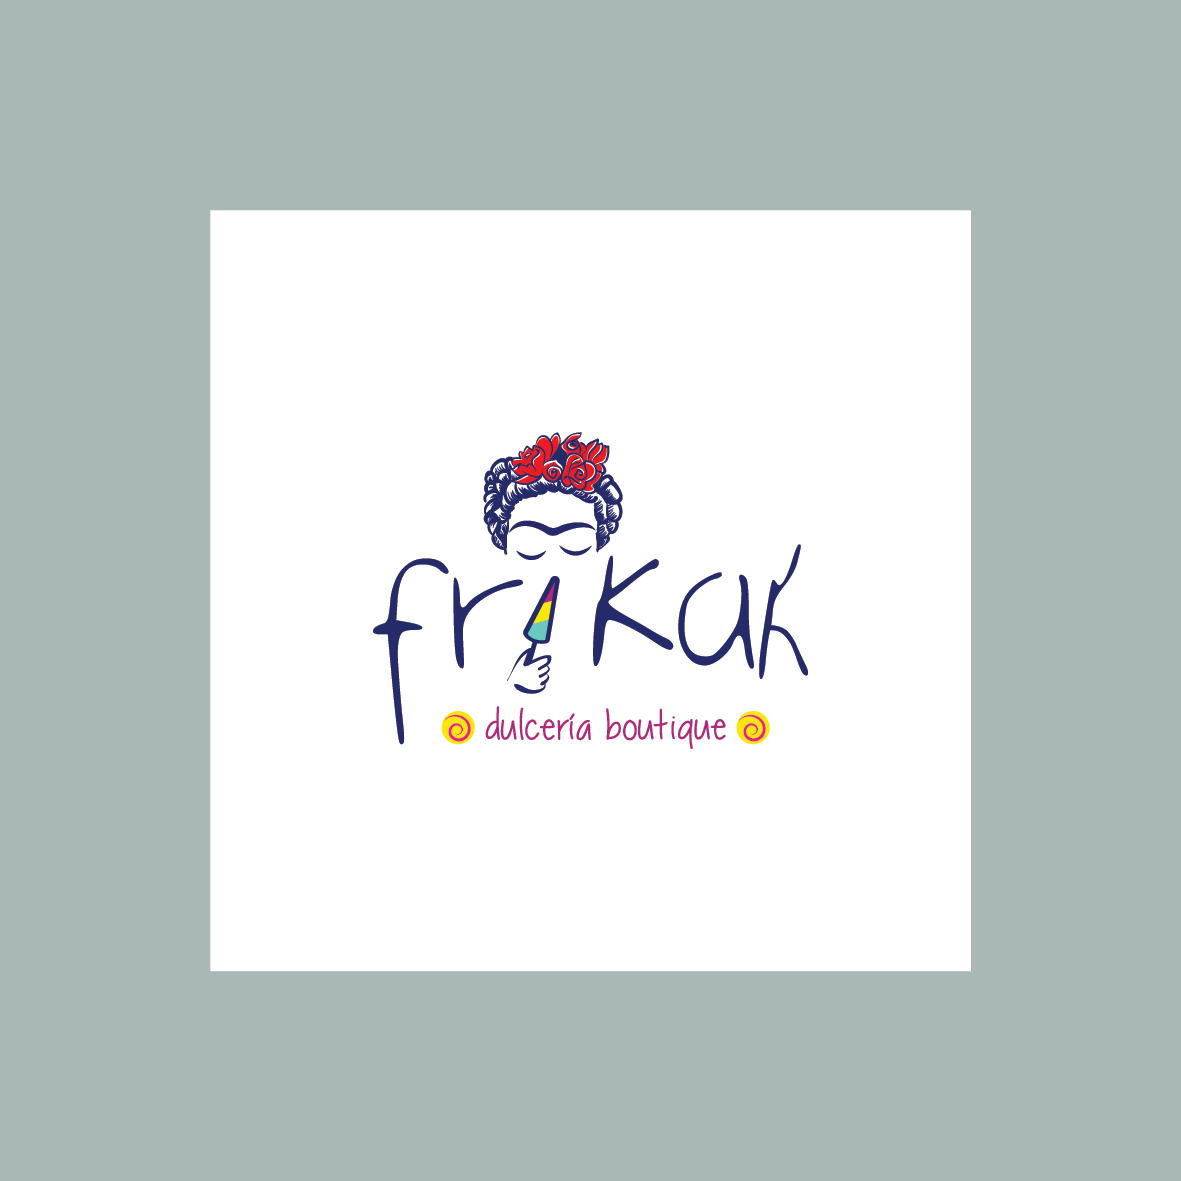 frikah dulceria logo